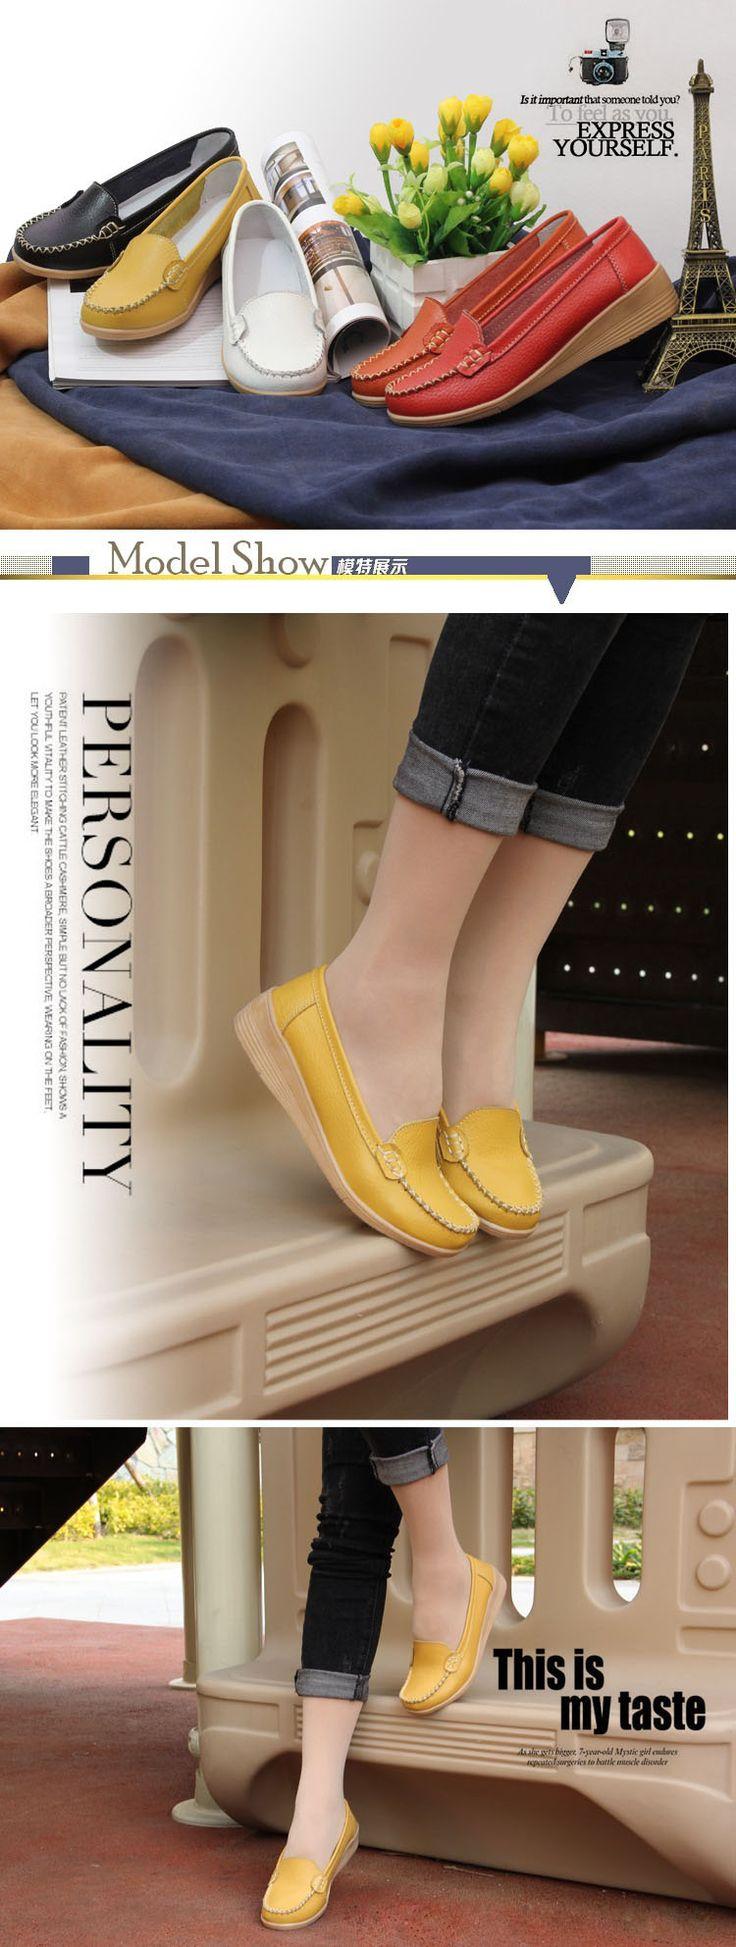 $15.95-AIER Women Slip On Home Leather Flats #omgnb #flatshoe #leather shoe